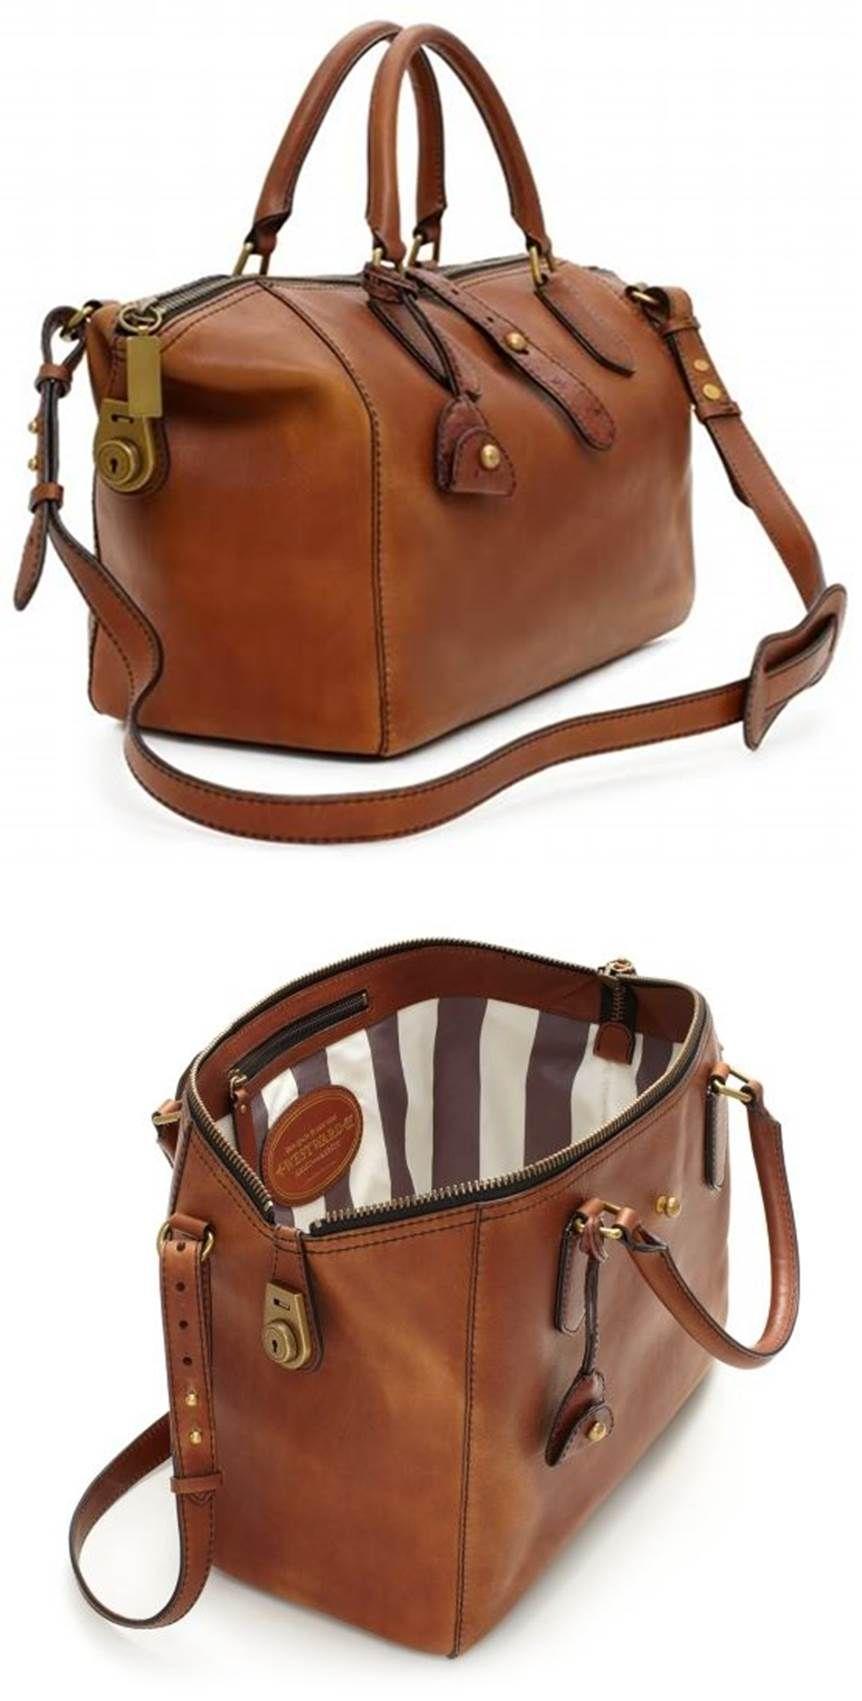 Designer Handbags Kate Spade Westward Leather Adventurer Satchel ...